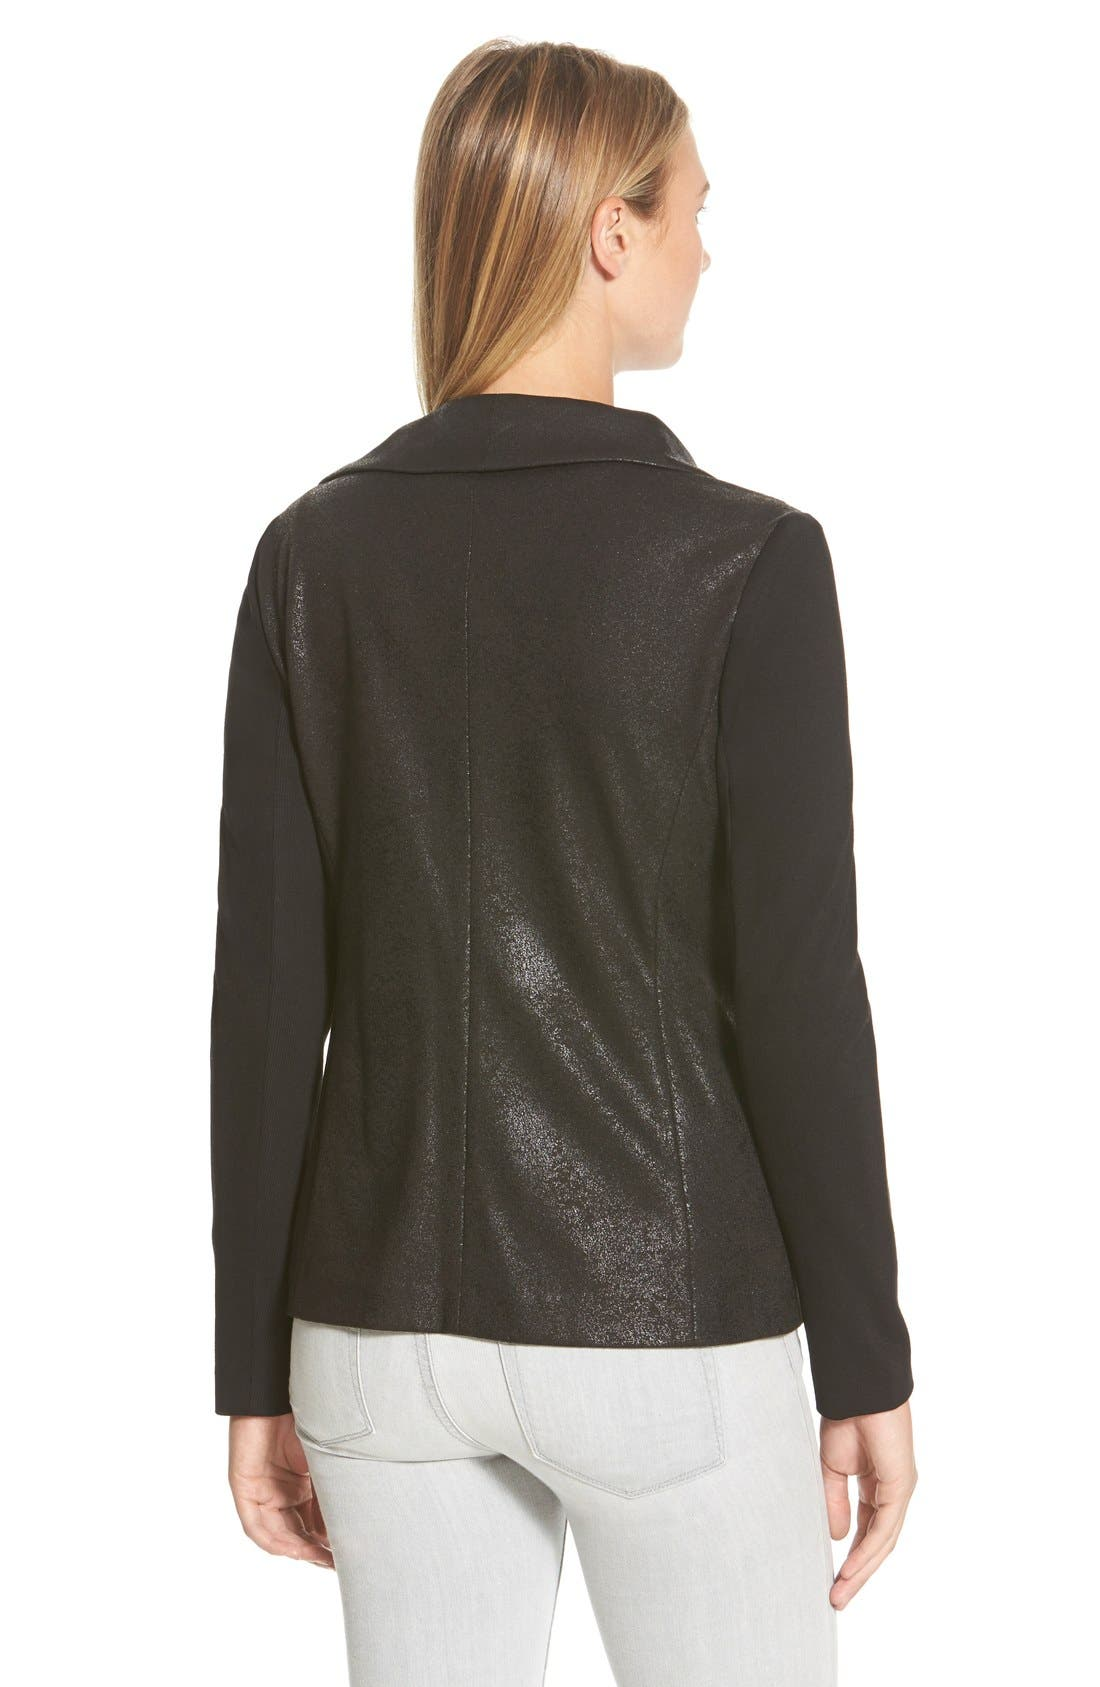 Distressed Foil Ponte Knit Asymmetrical Jacket,                             Alternate thumbnail 2, color,                             Rich Black